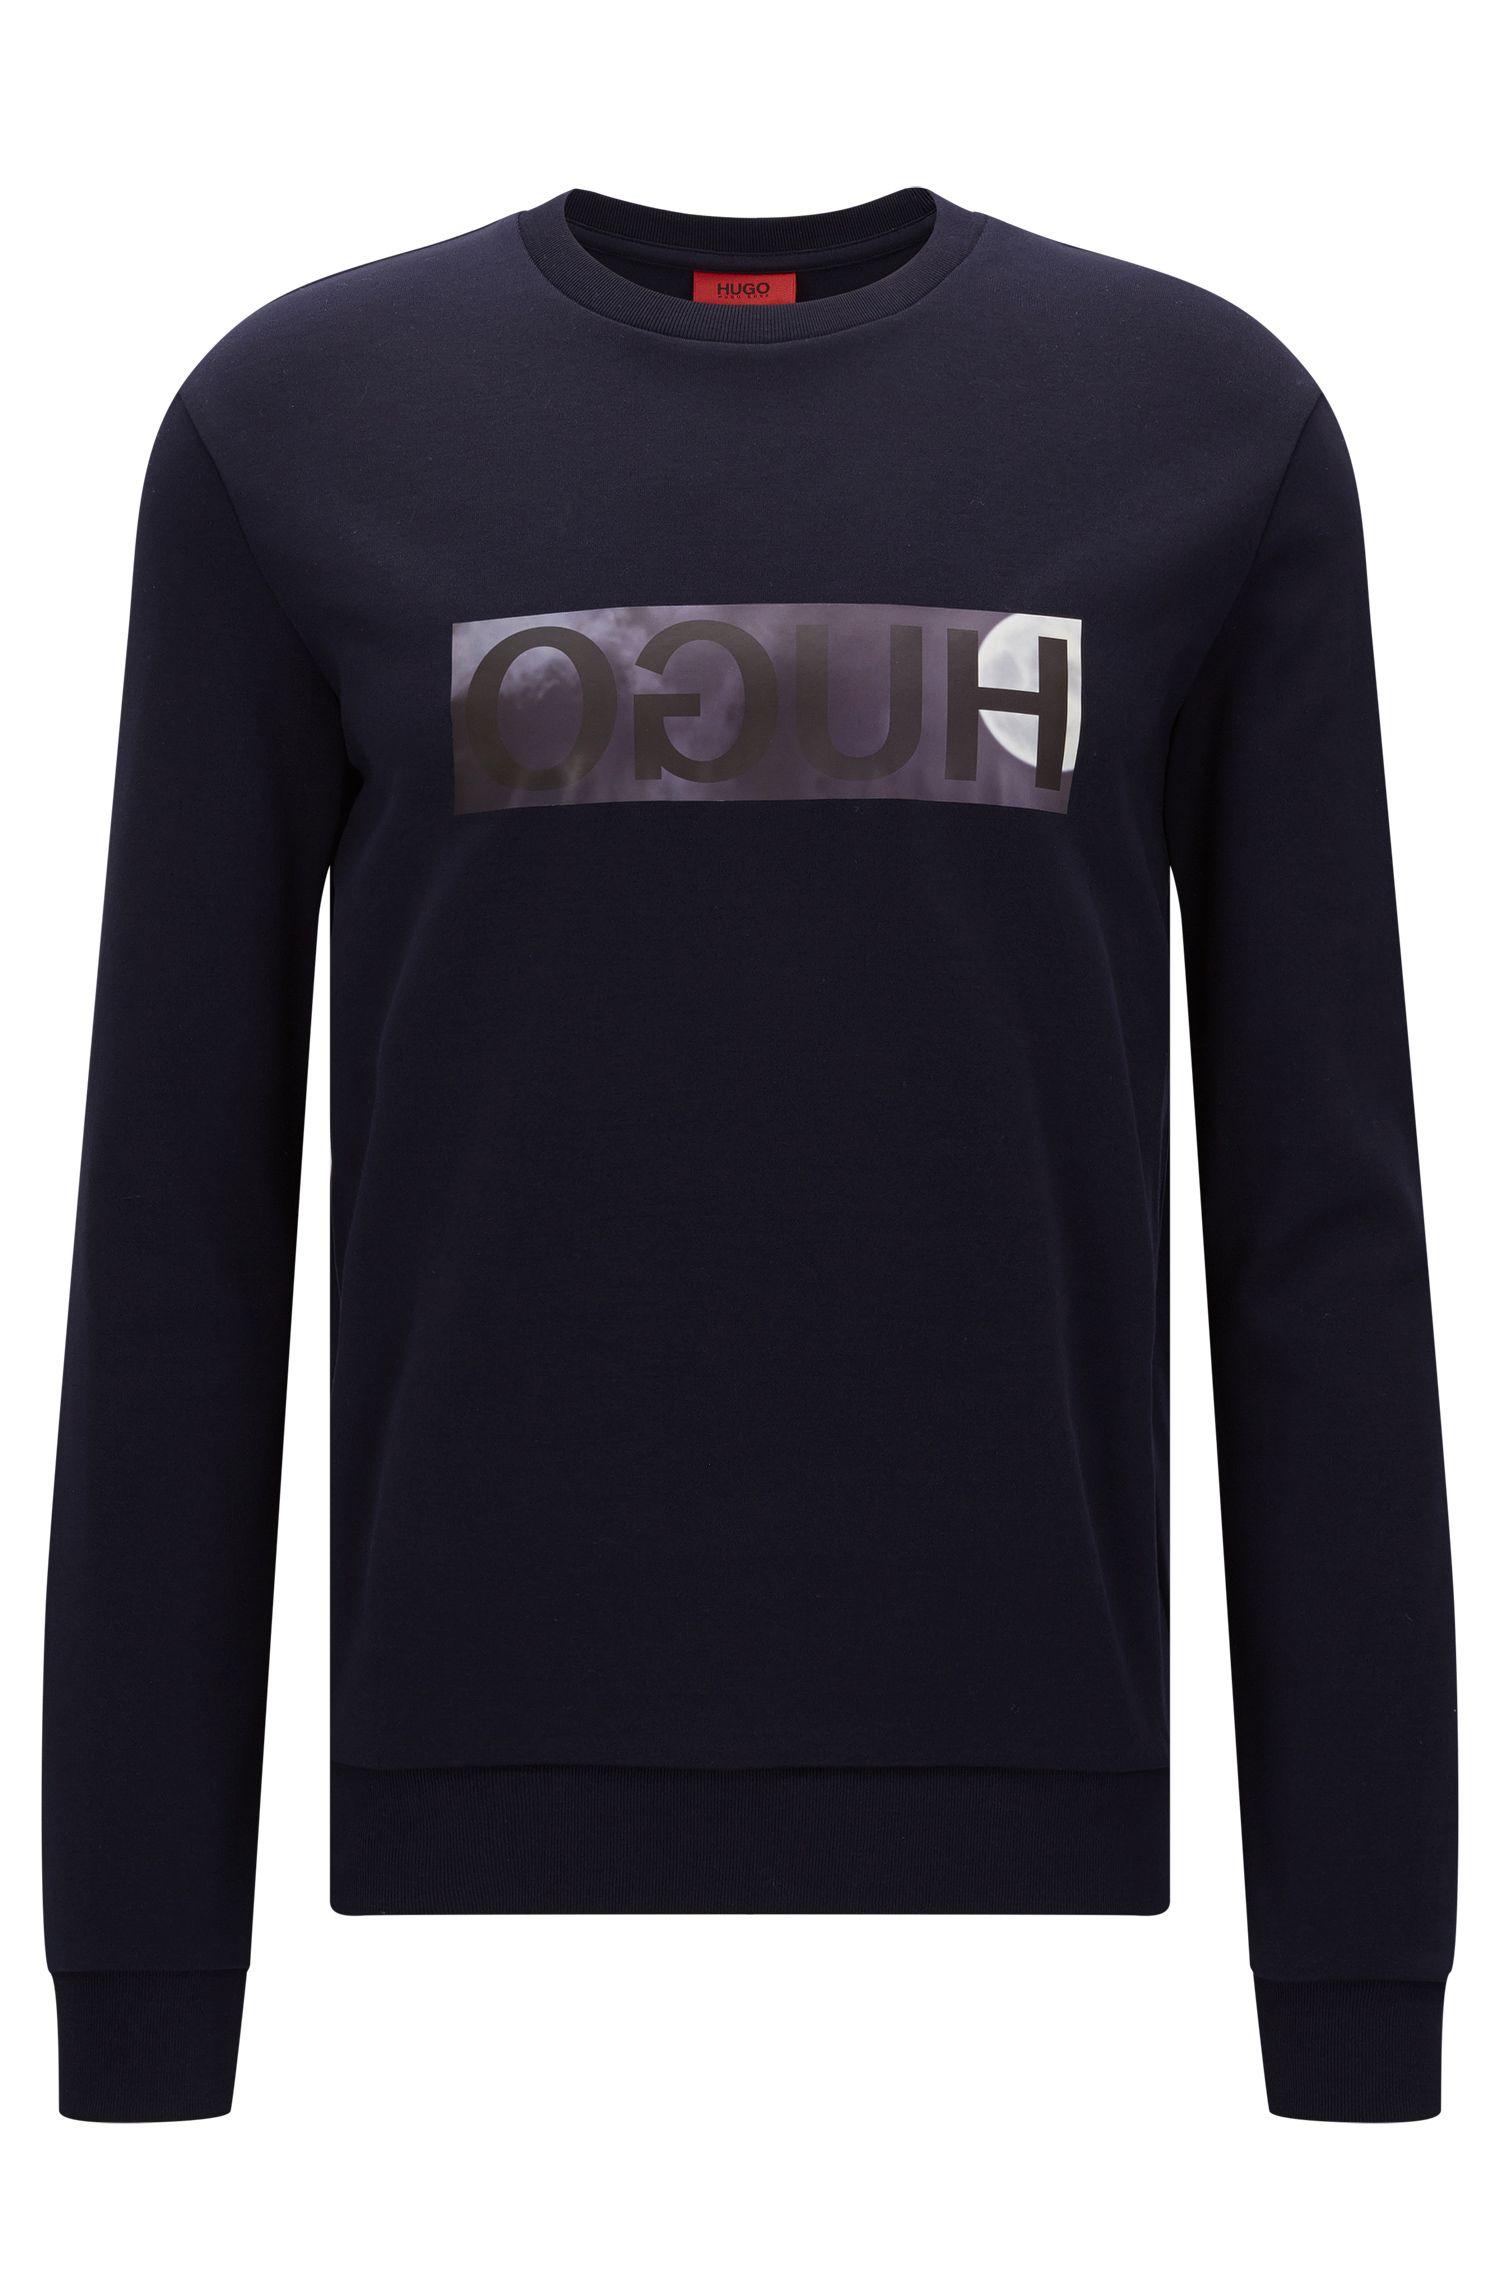 'Dicagos'   Rubber Print Sweatshirt